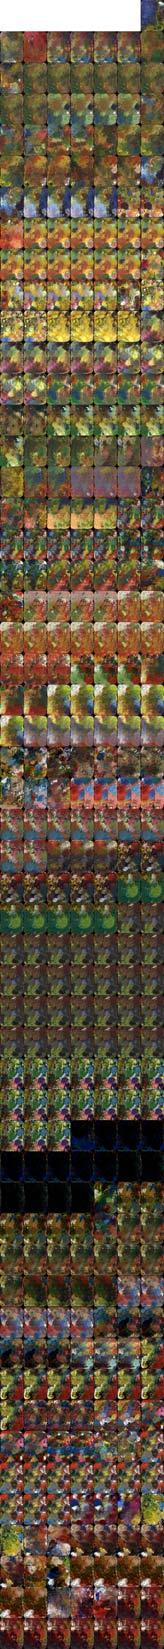 palettes_2005_grid.jpg